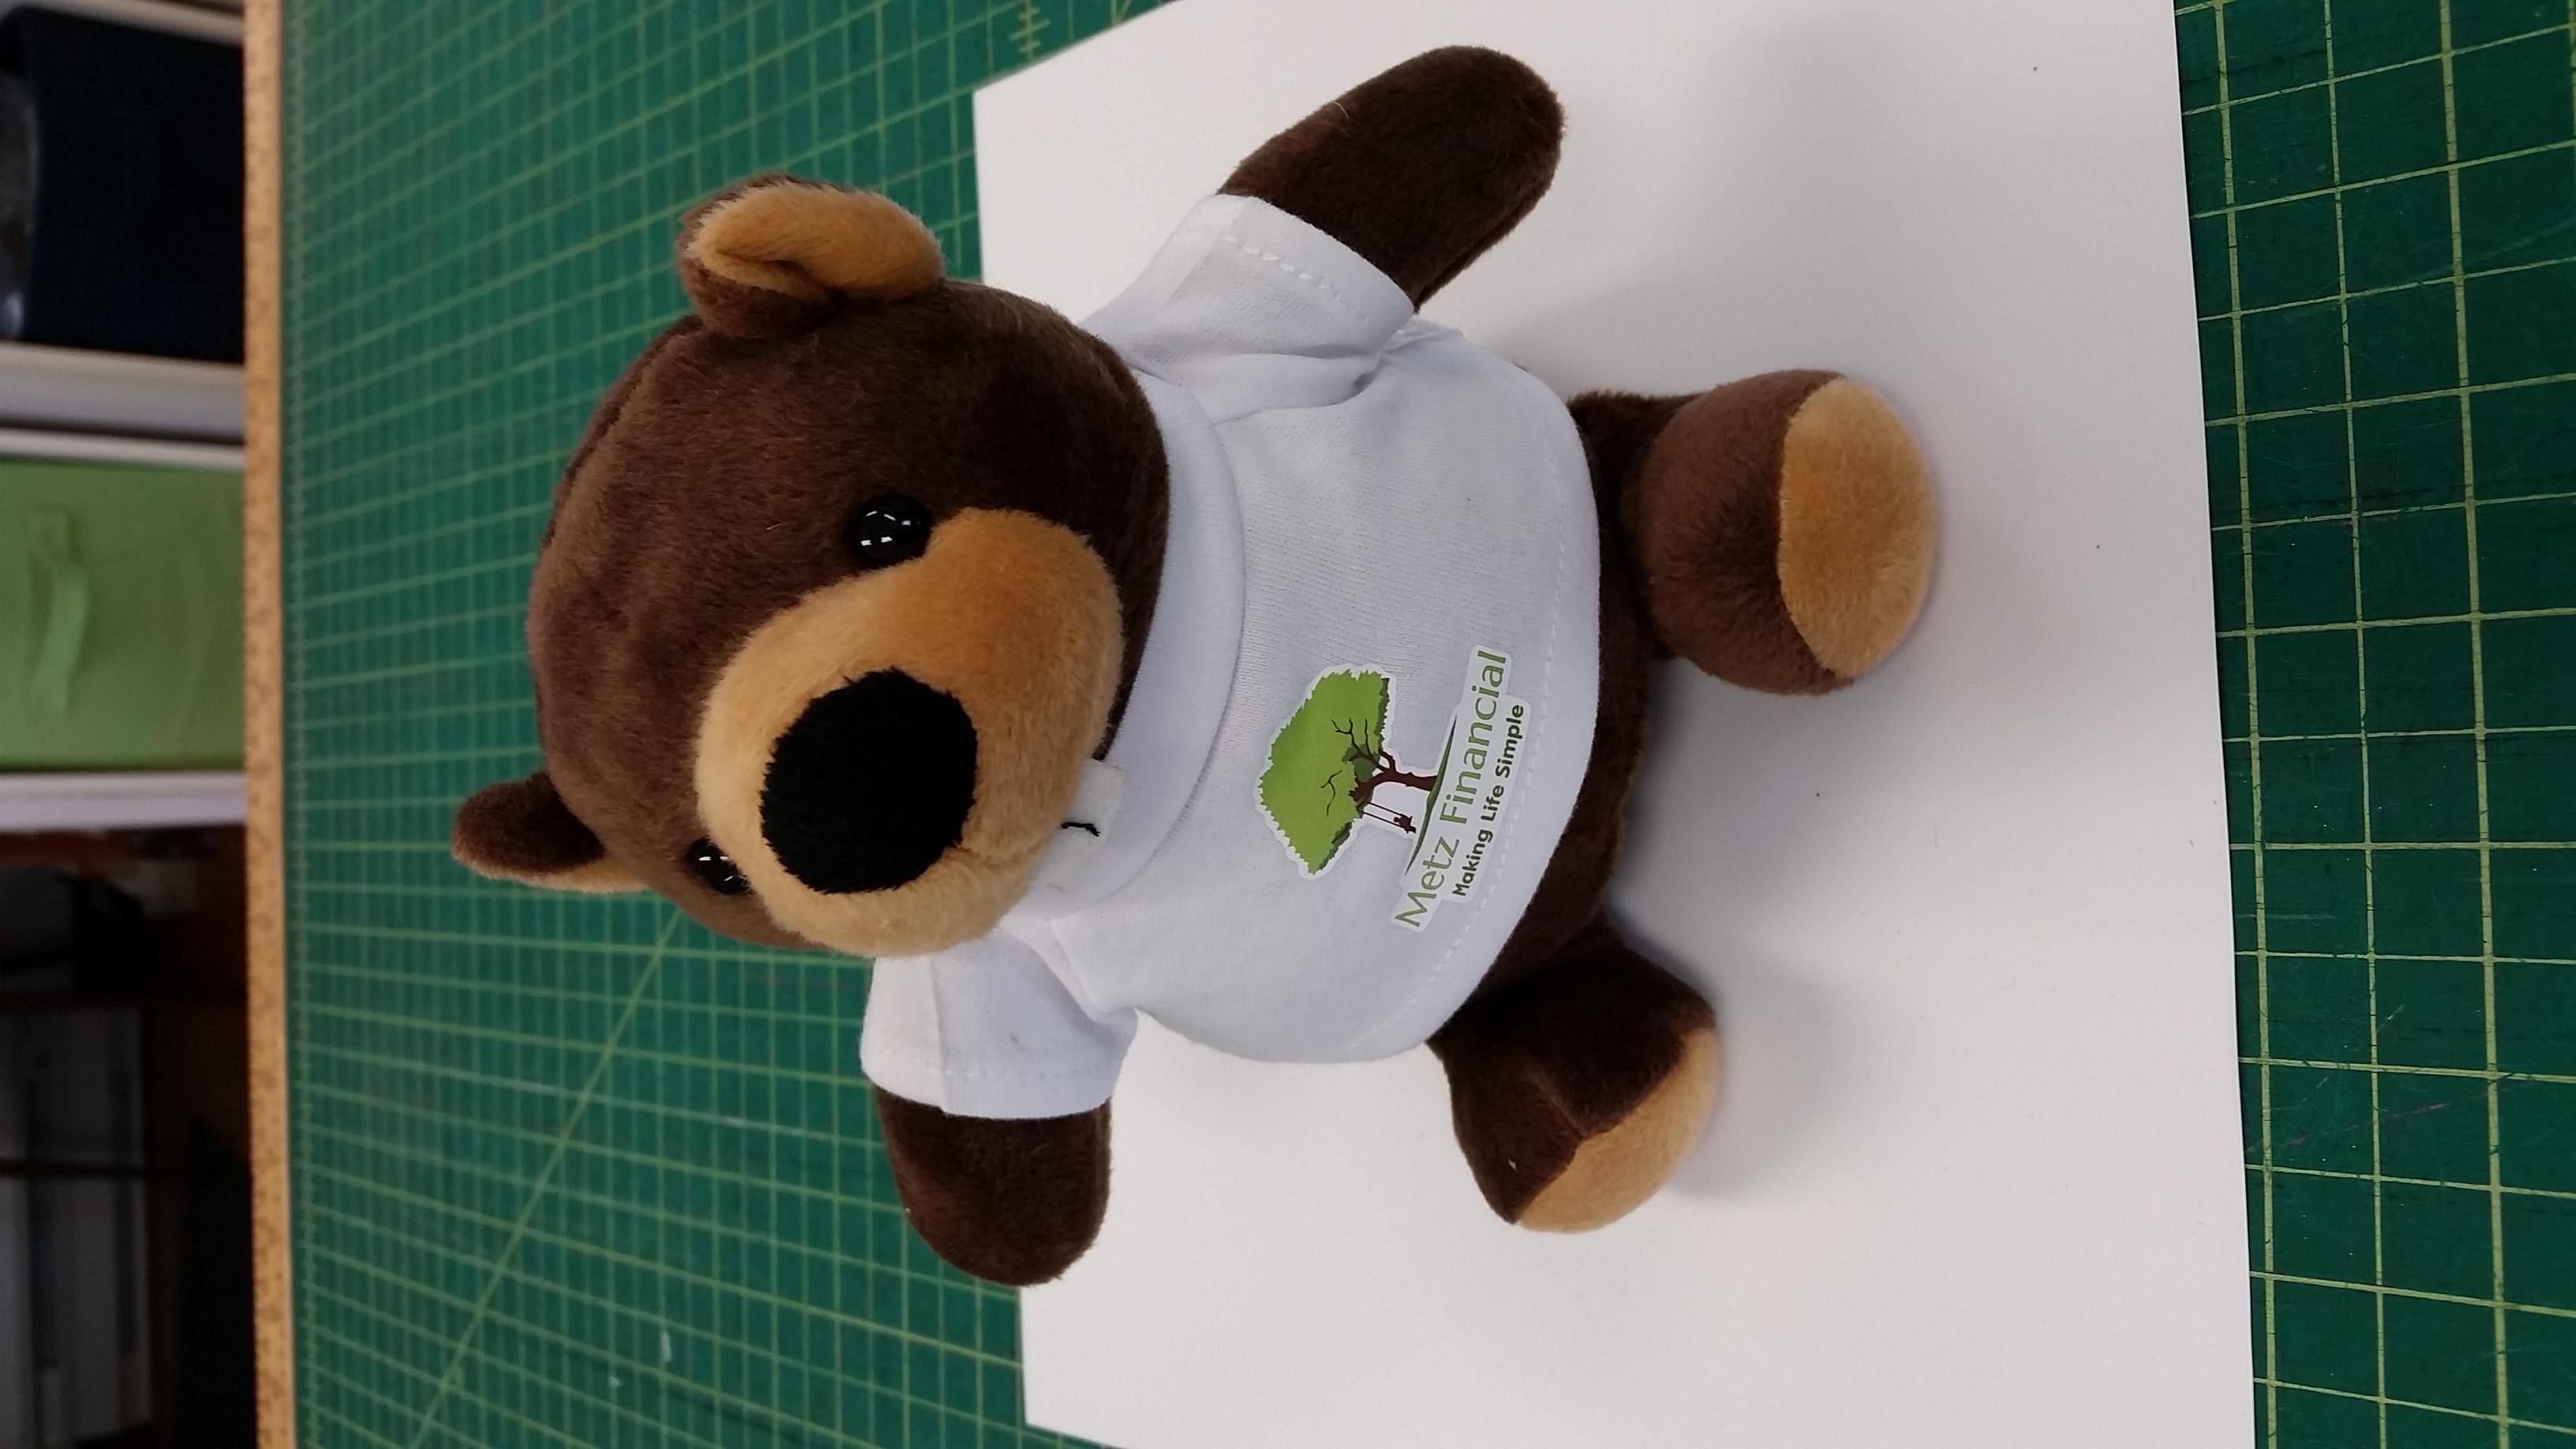 Promo teddy bears